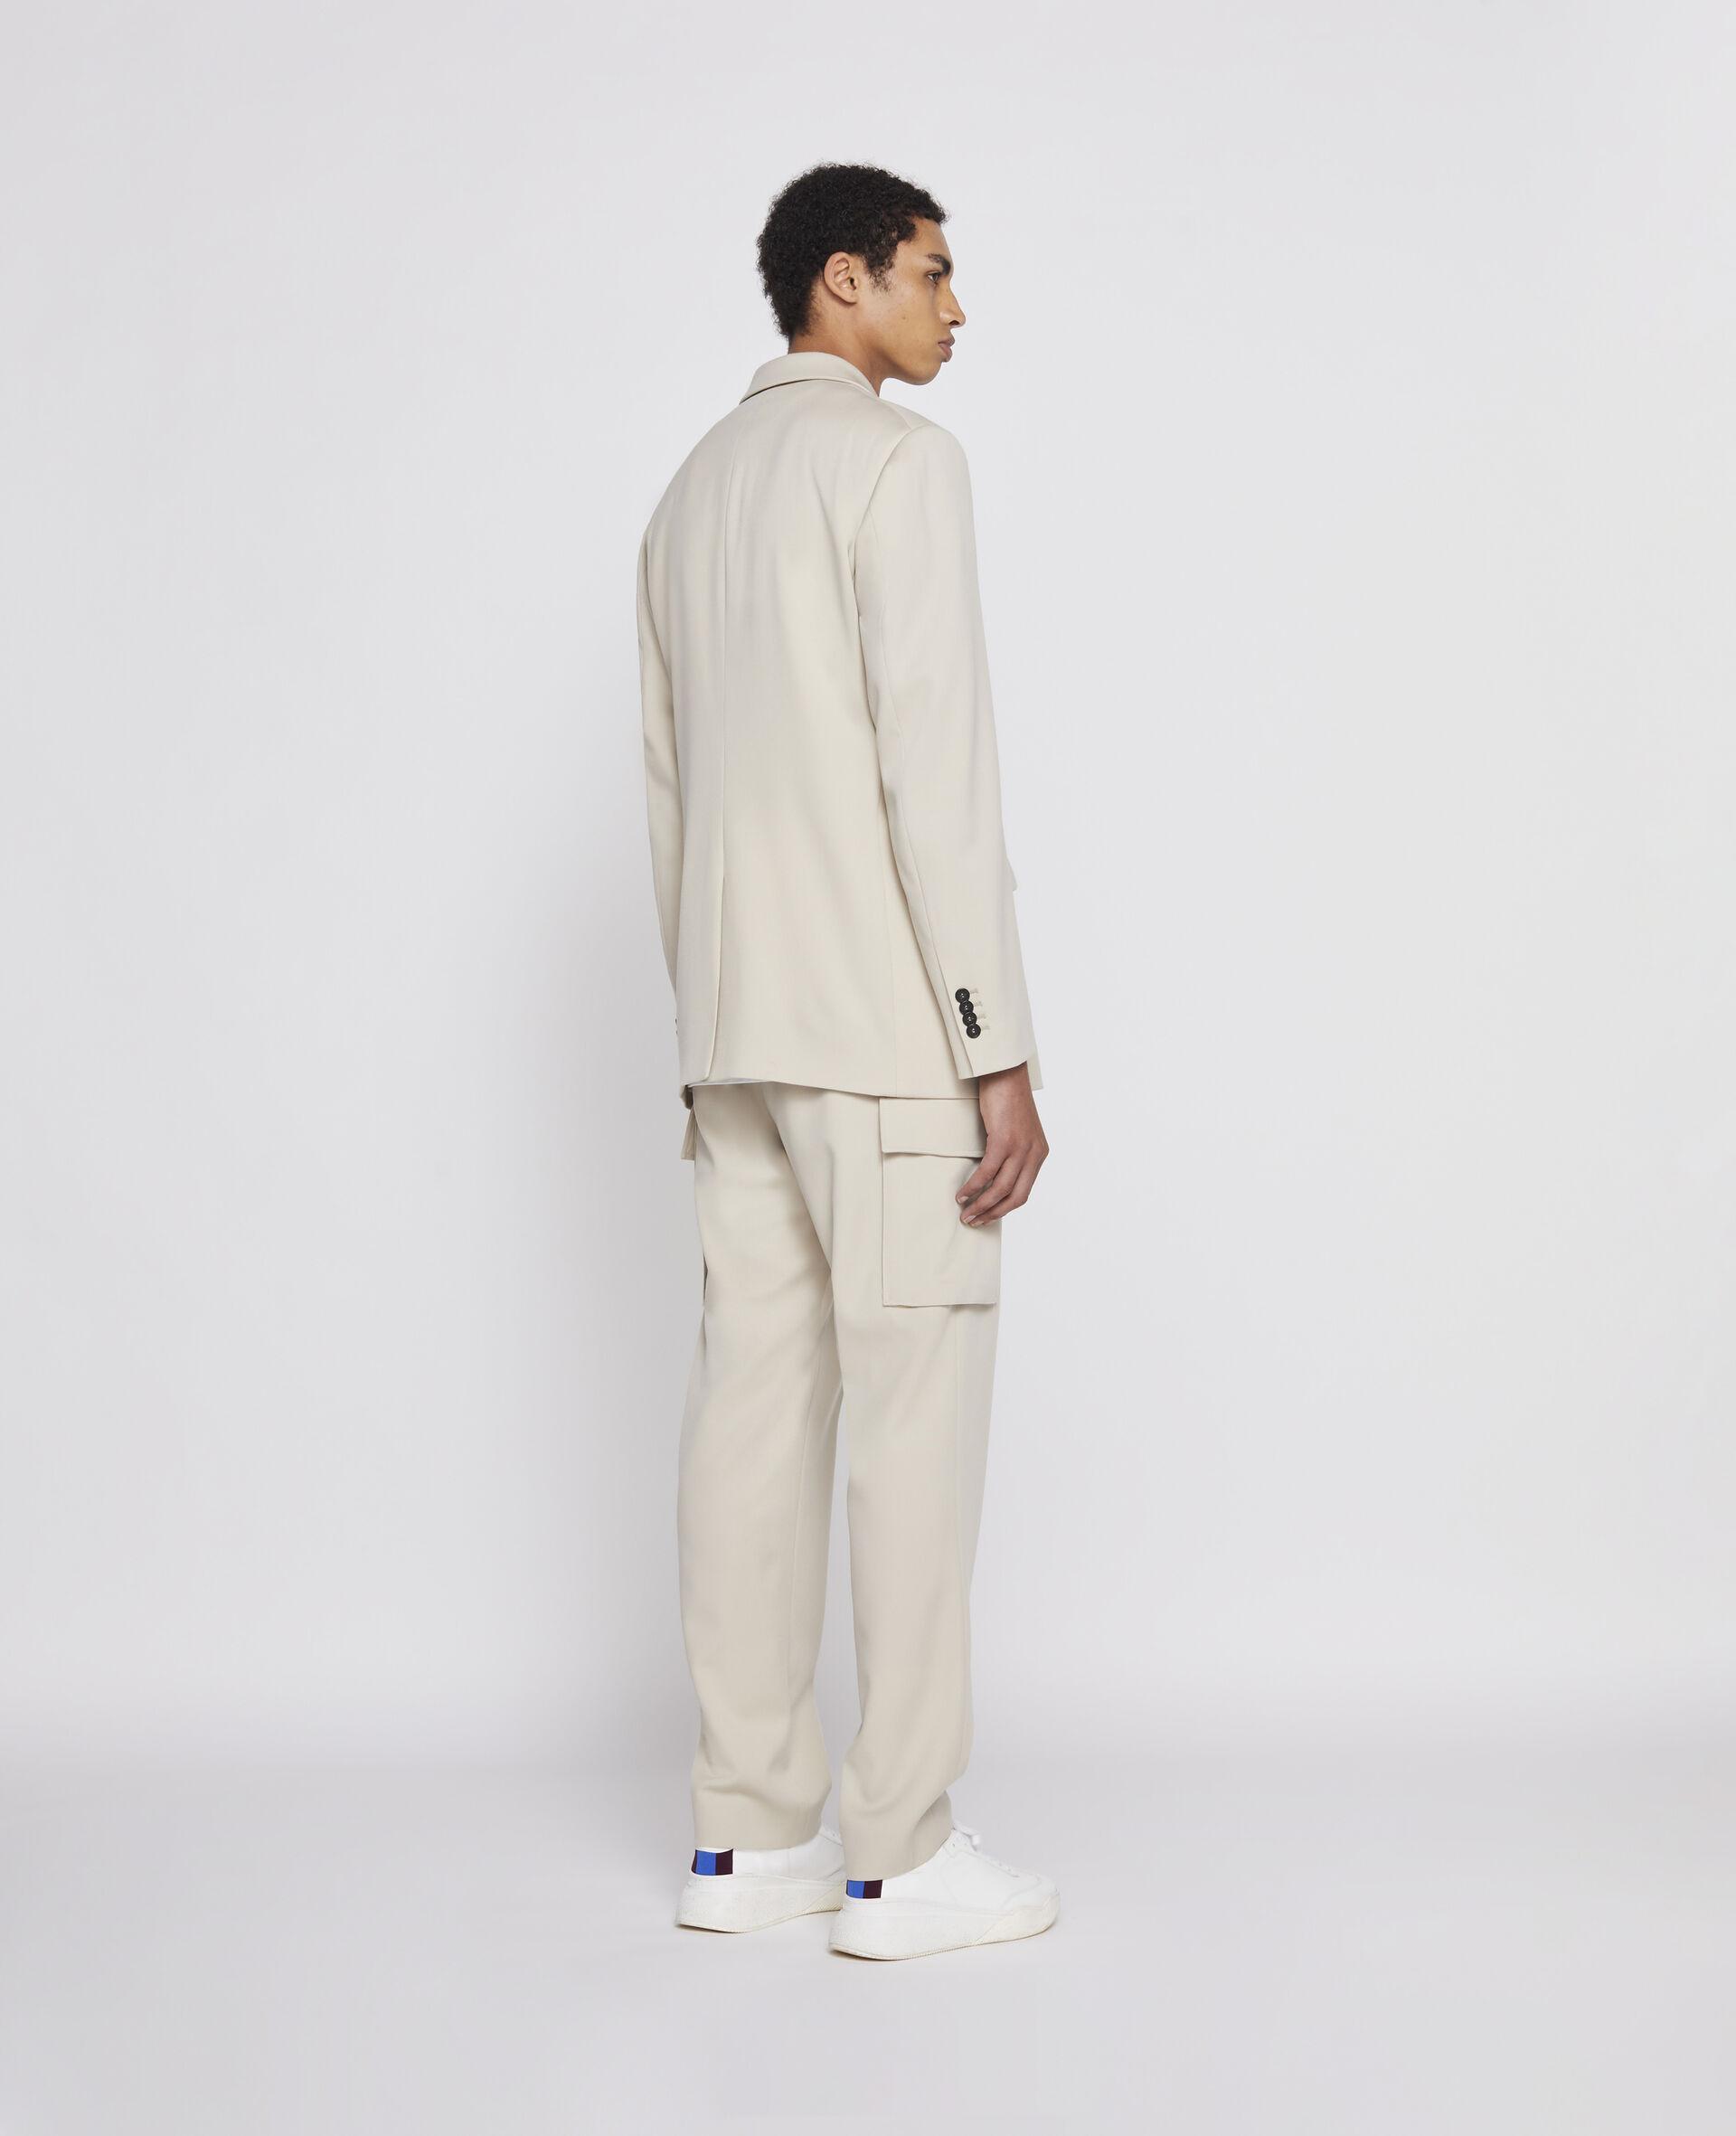 浅沙色裤装-米色-large image number 2